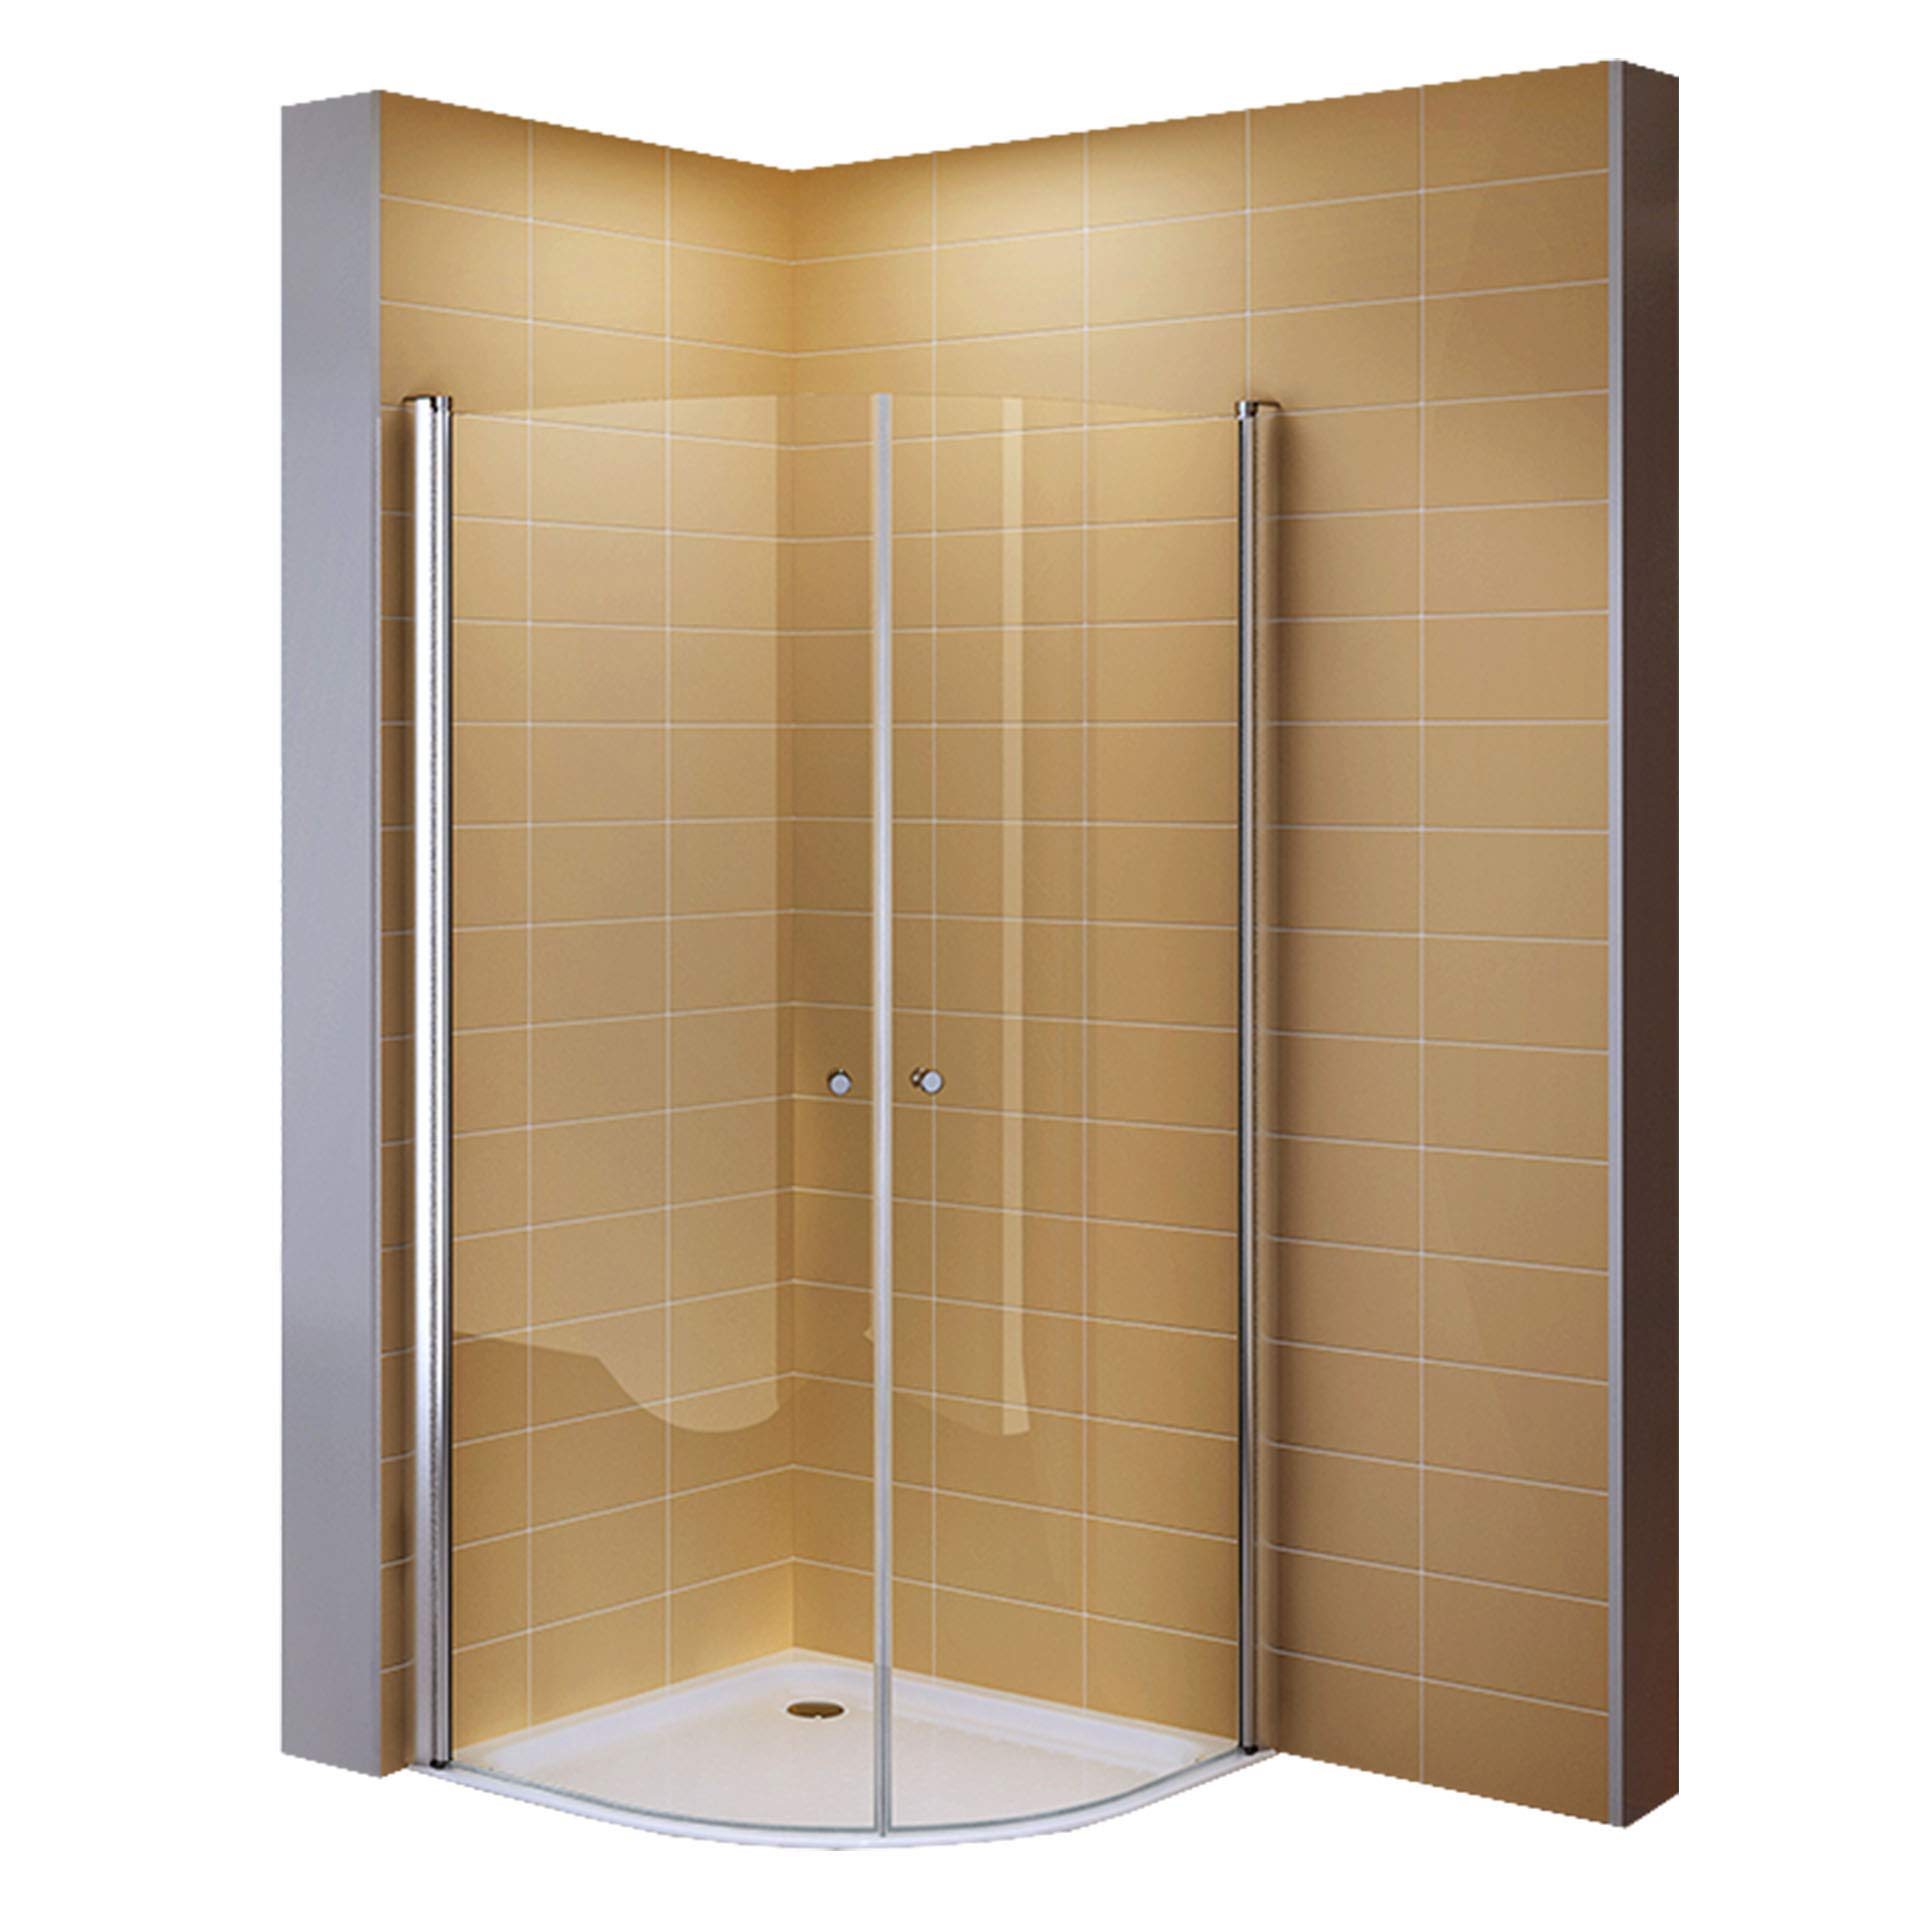 I-flair - Mampara de ducha con cristal de seguridad (90 x 90 cm ...